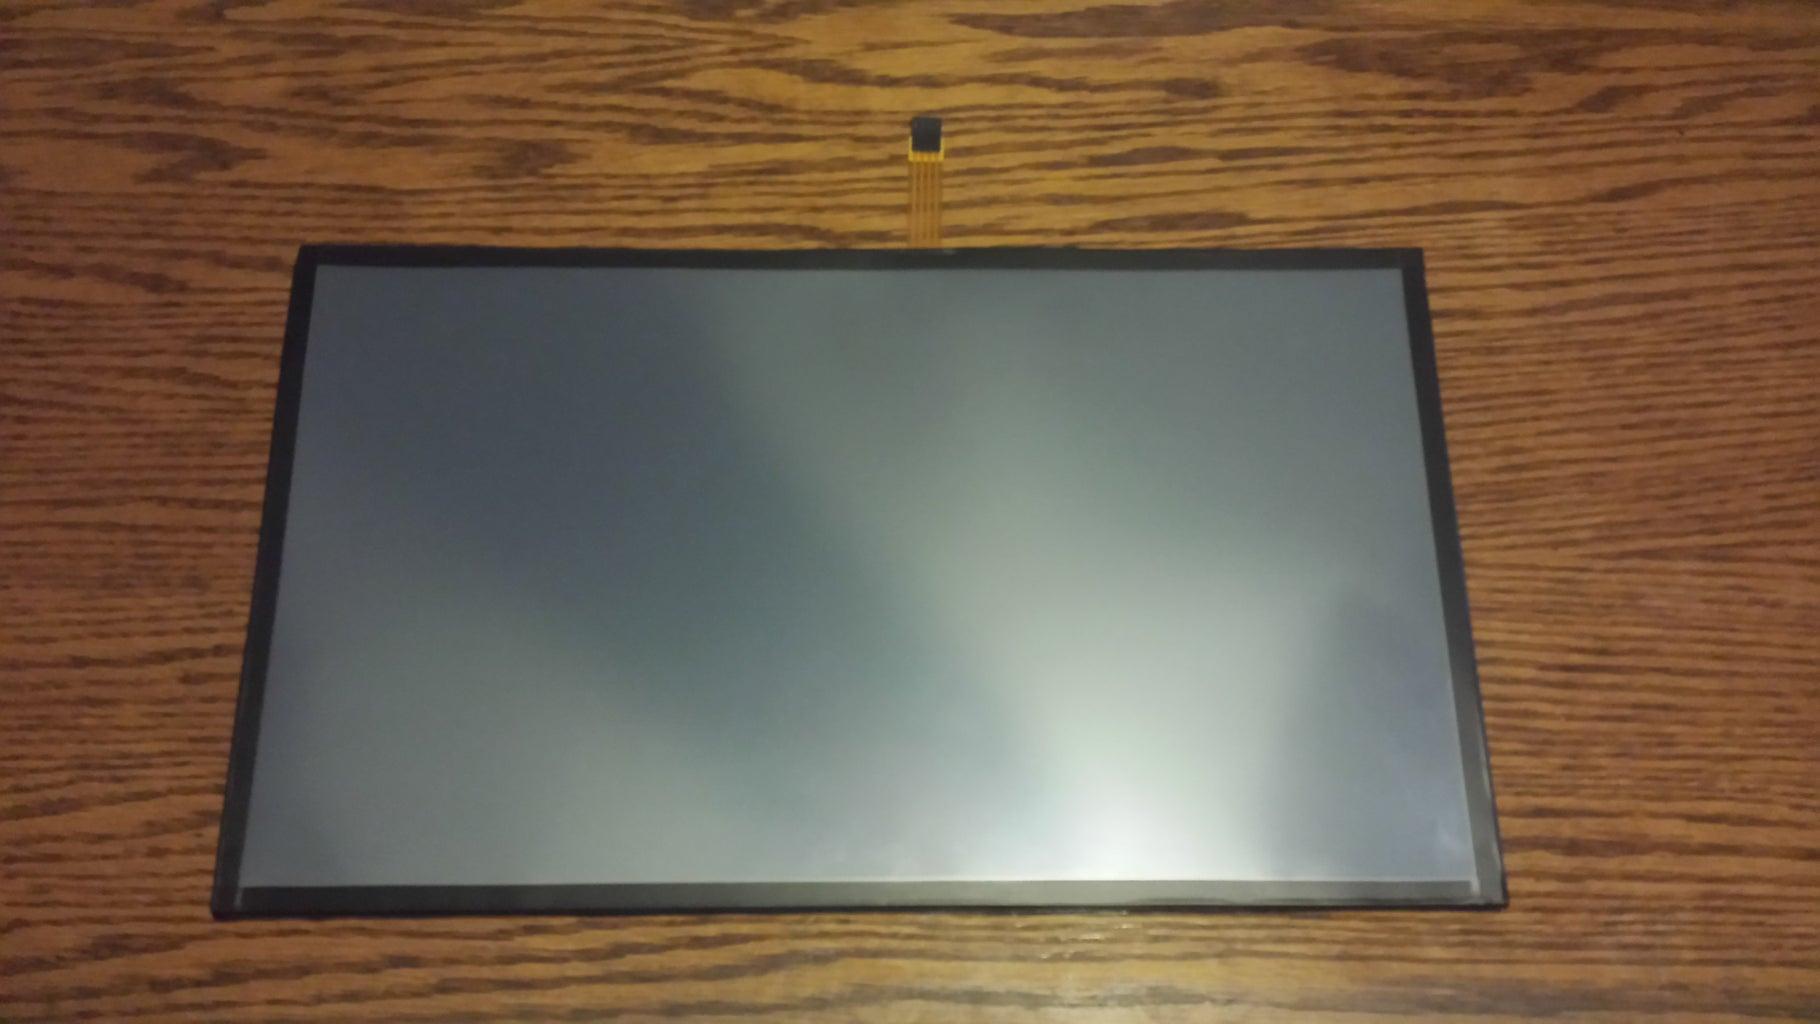 Touchscreen Setup (applying the Touchscreen Overlay)